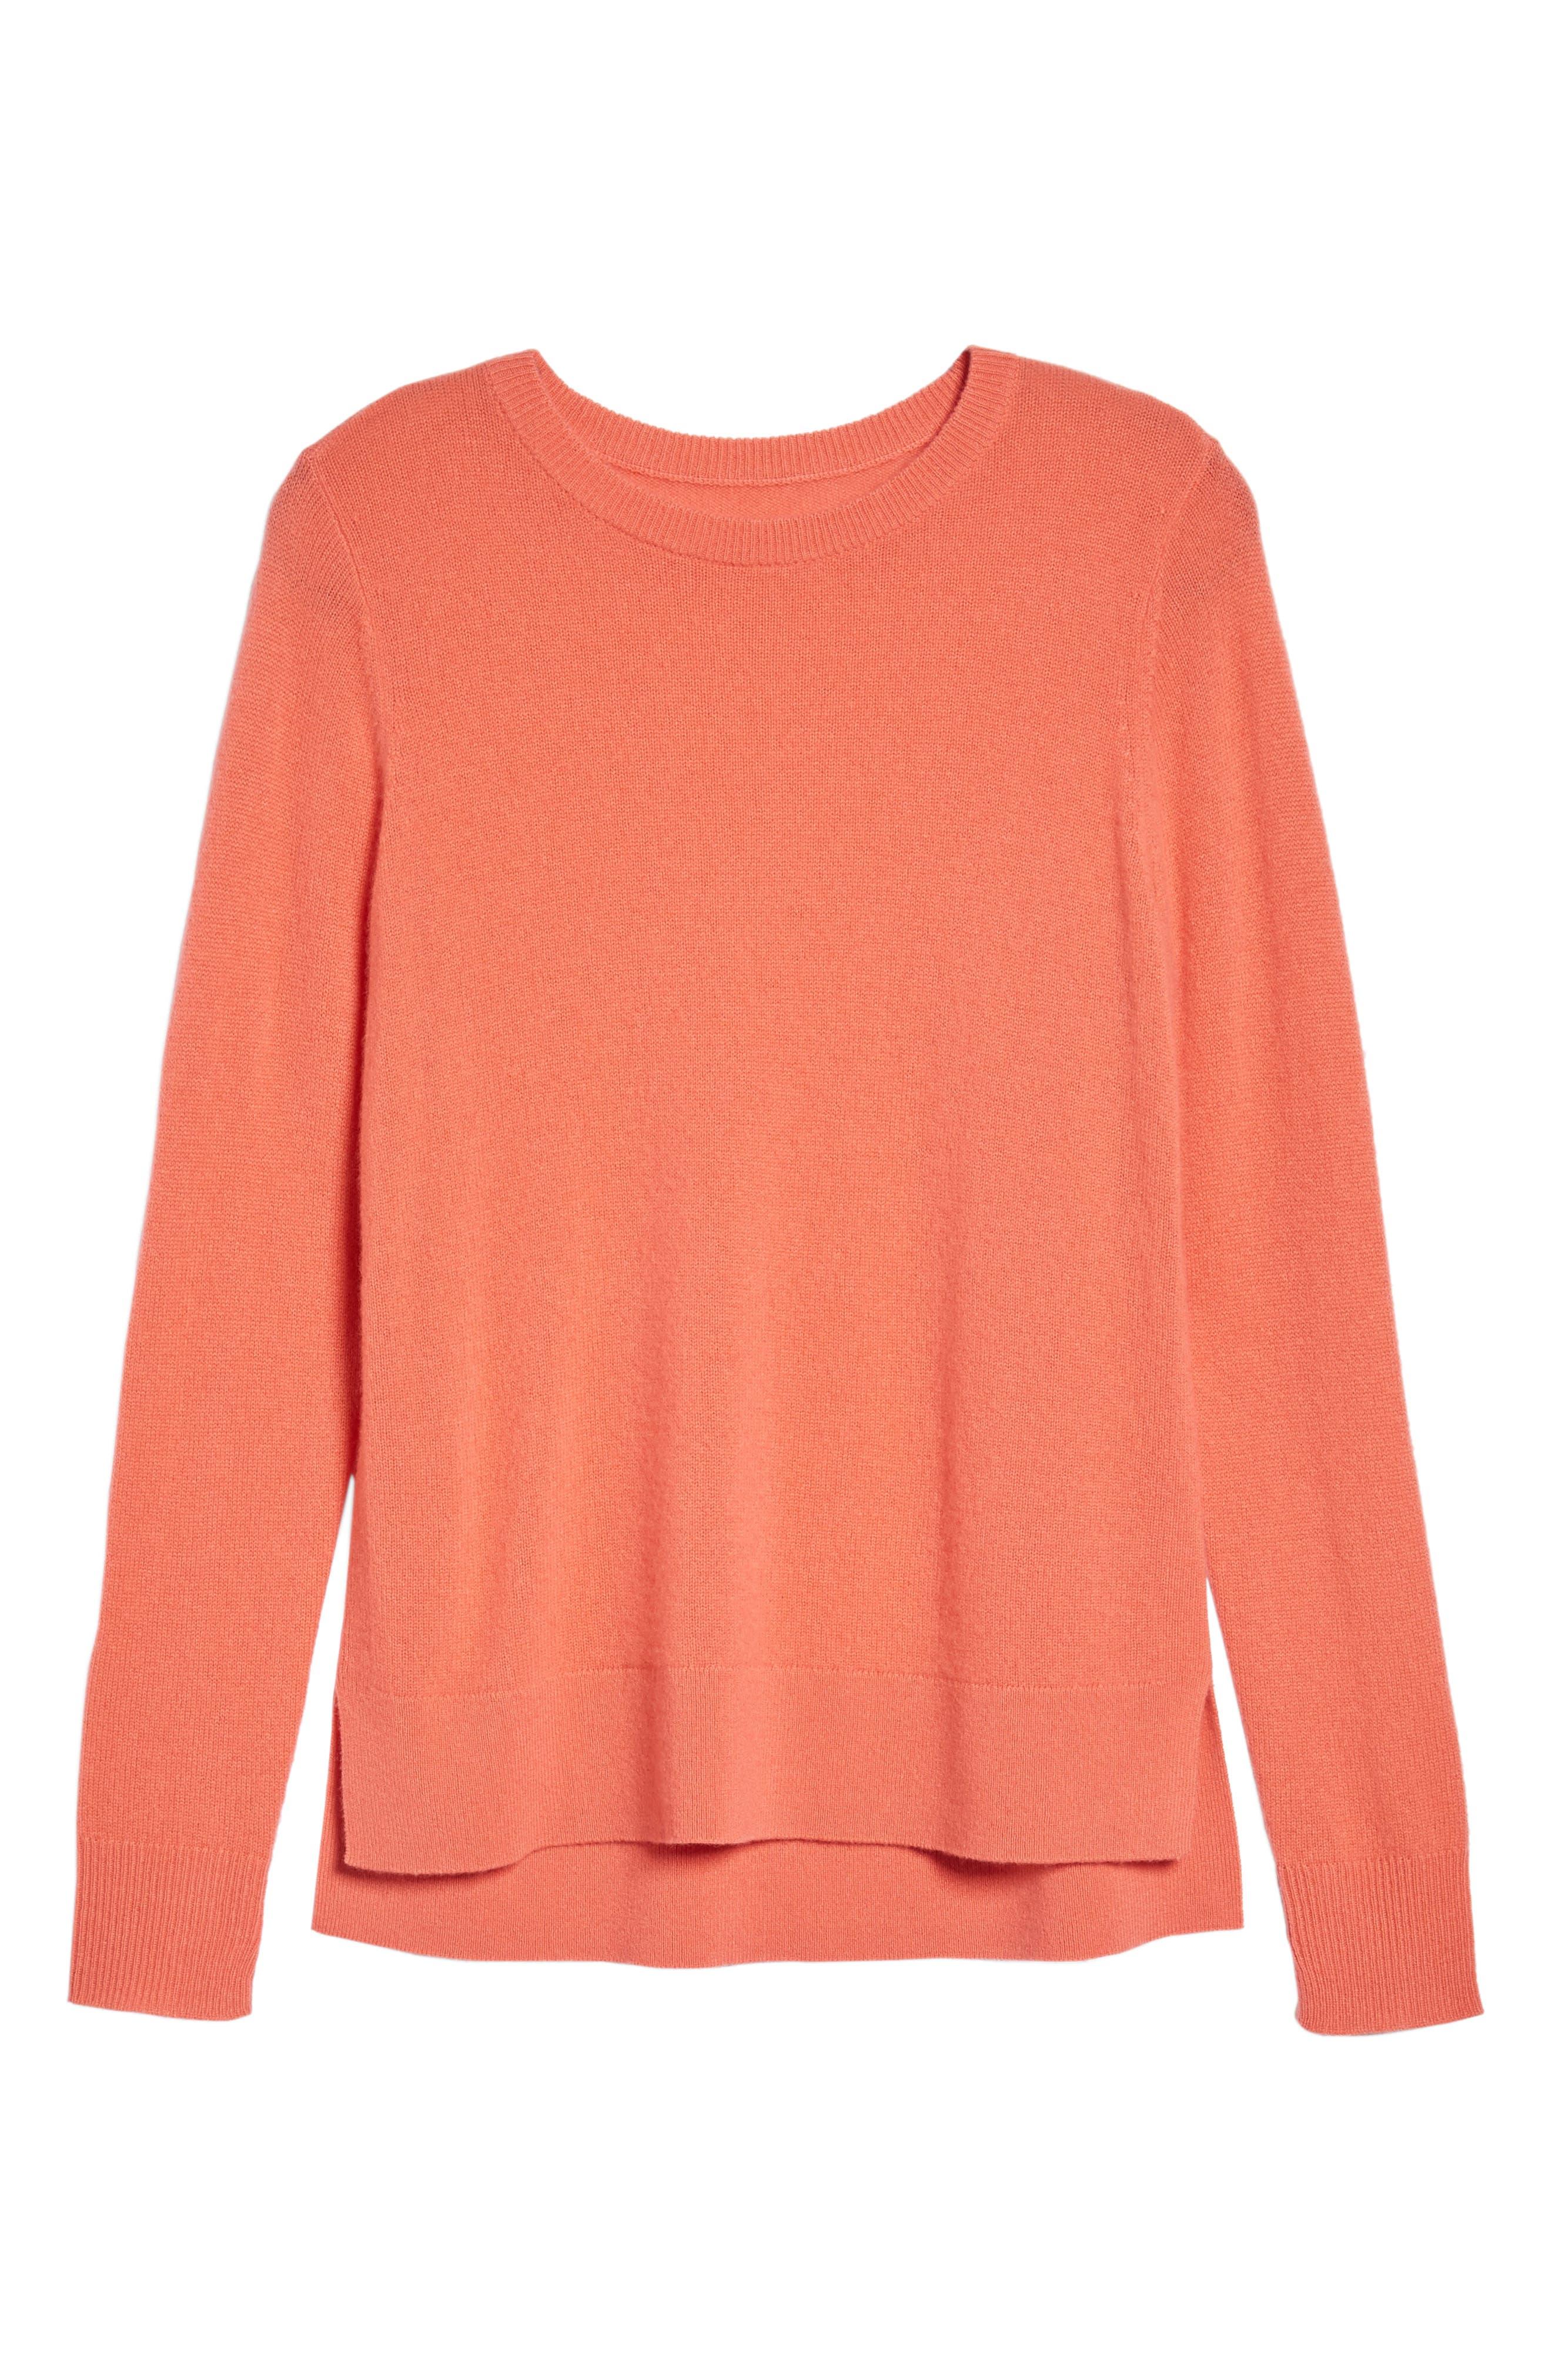 ,                             Crewneck Cashmere Sweater,                             Alternate thumbnail 236, color,                             950